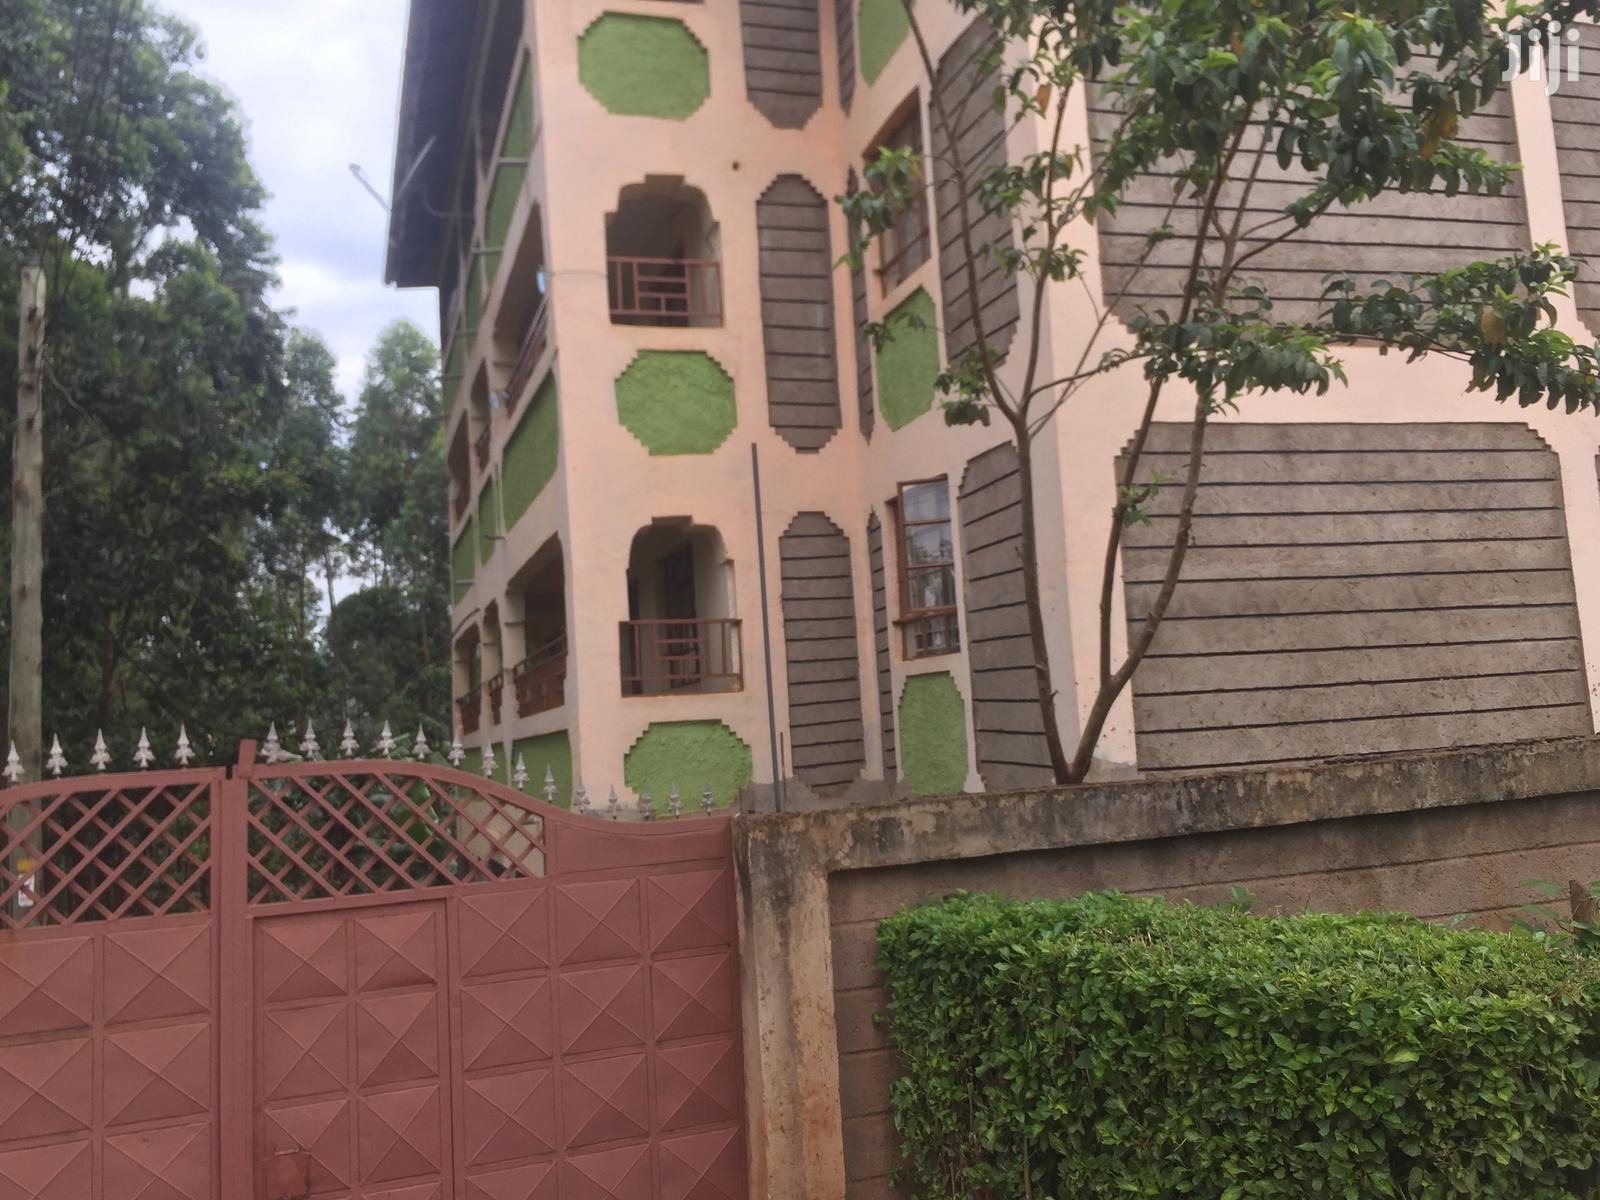 2 Bedroom Rental Flats At Nyakoe Kisii